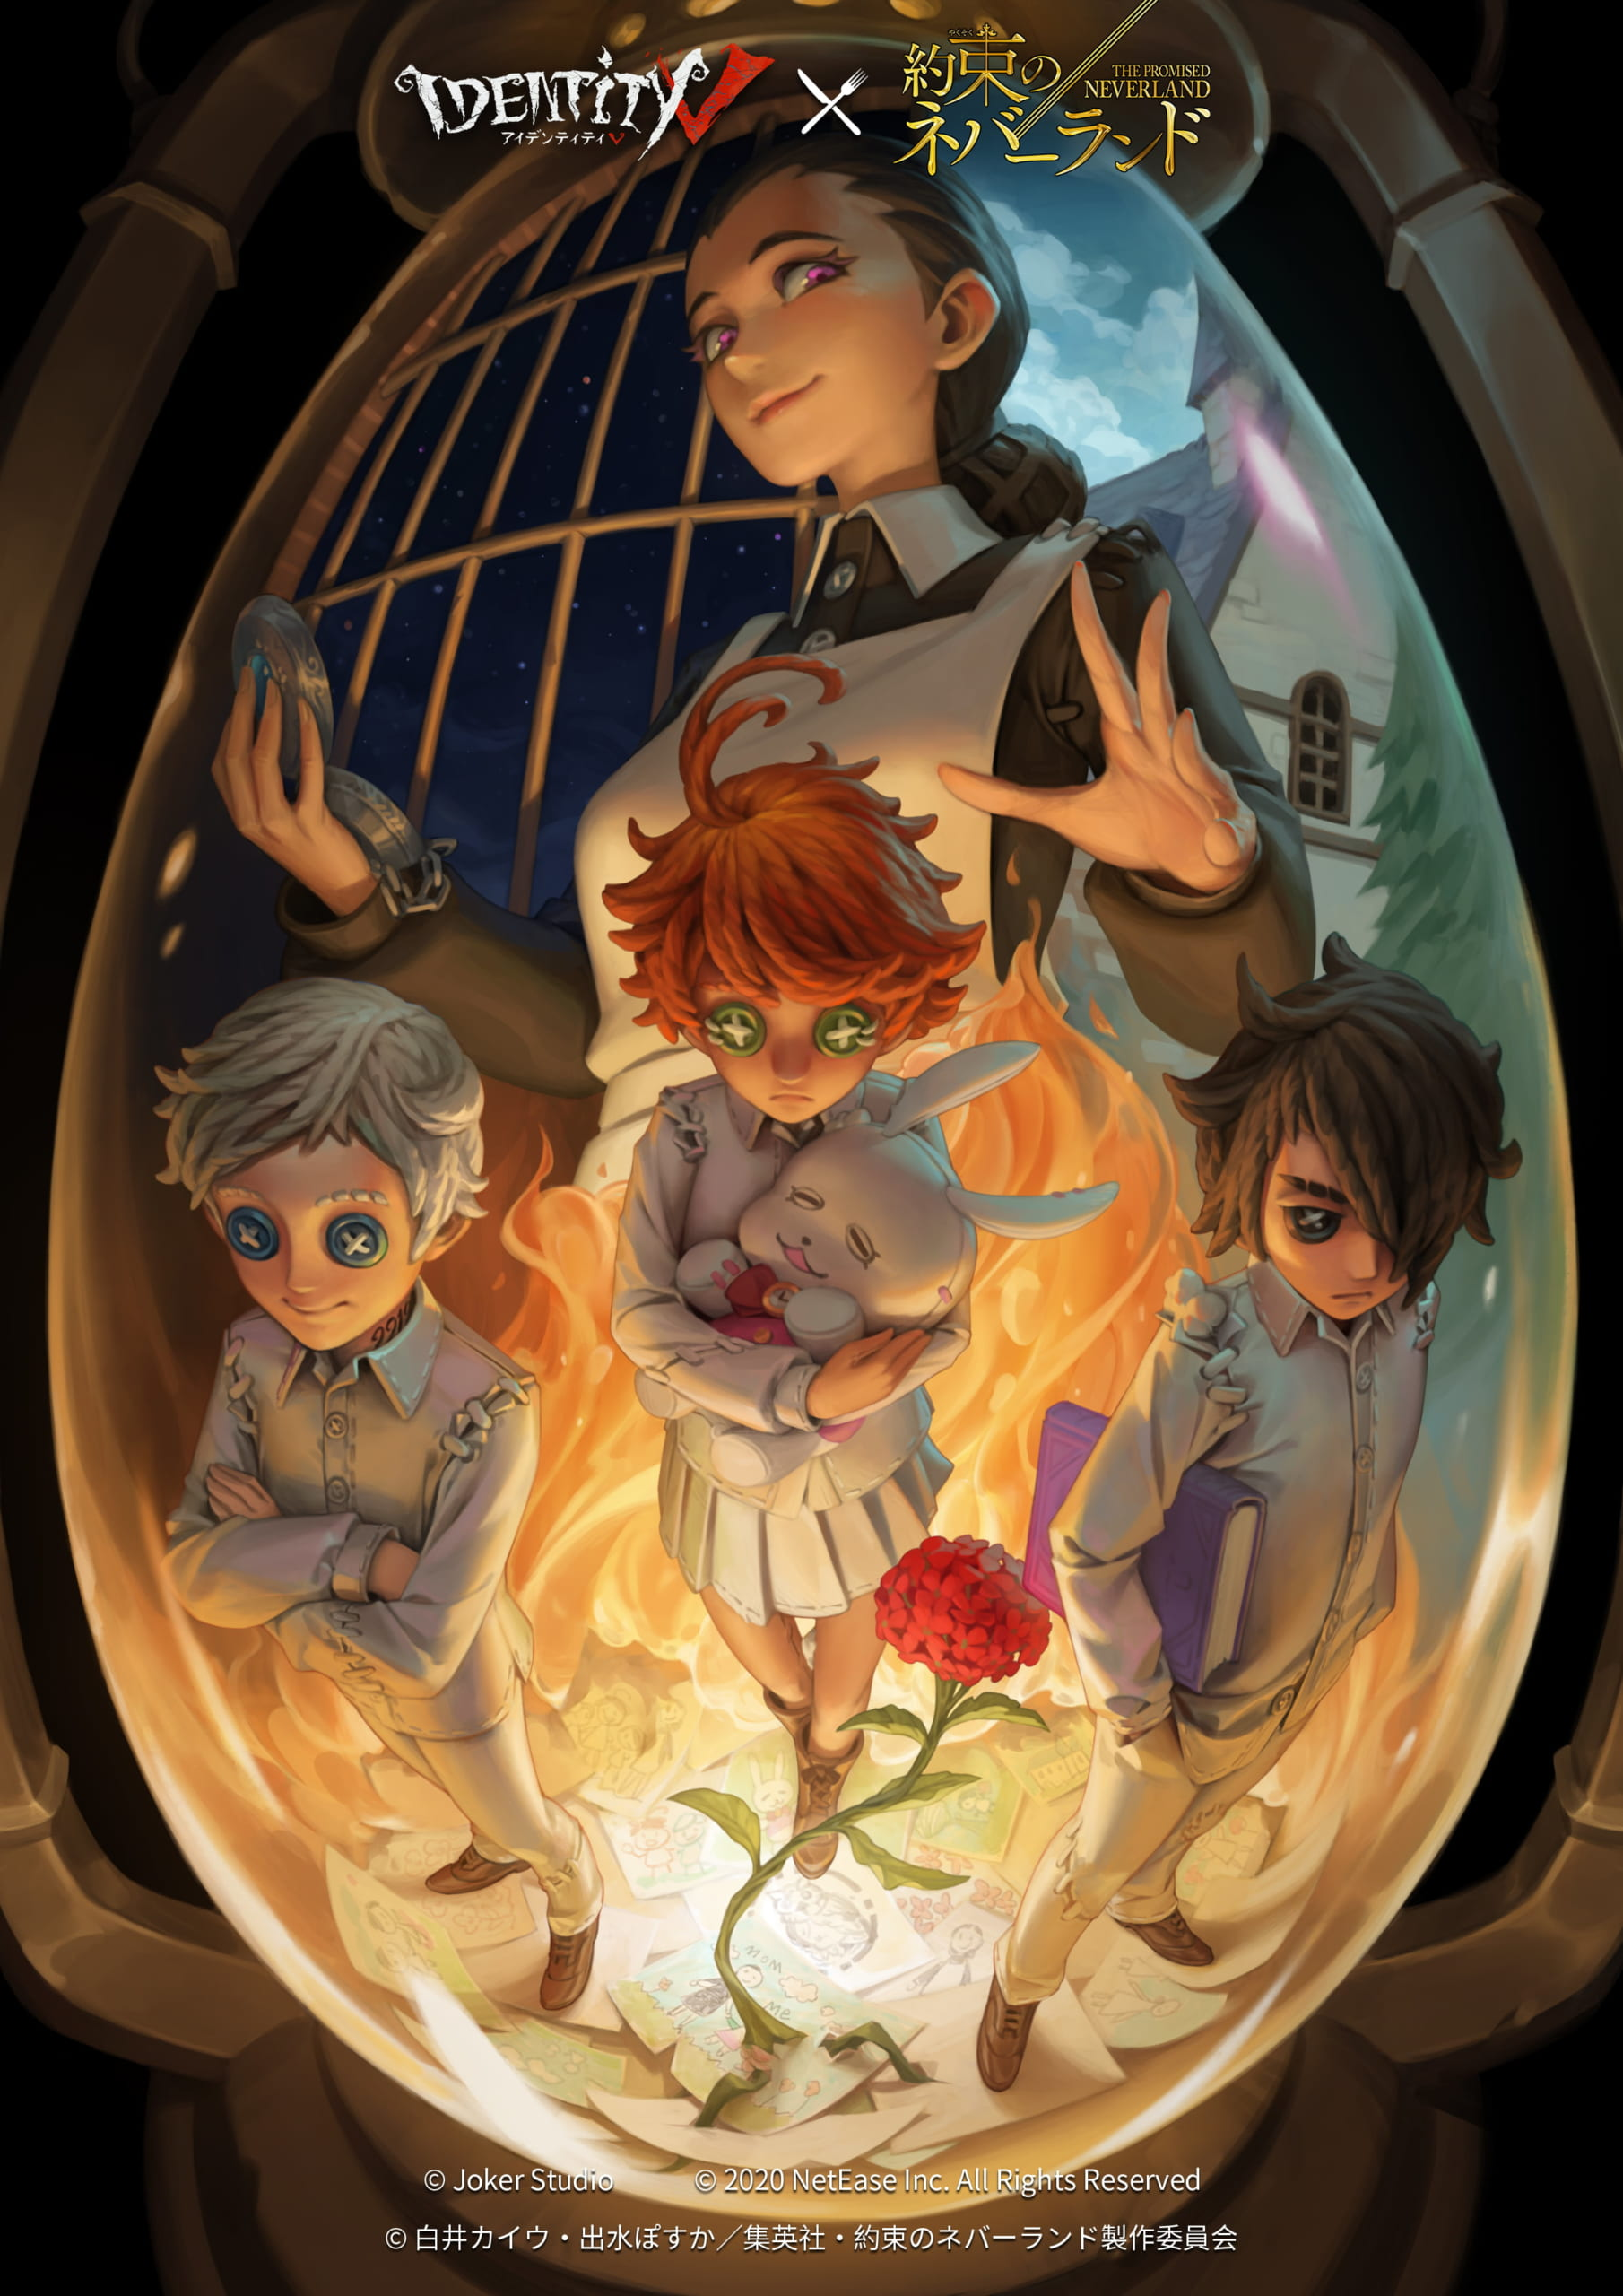 「Identity V 第五人格」×「約束のネバーランド」コラボビジュアル&PV公開!イベントは2月23日より開催